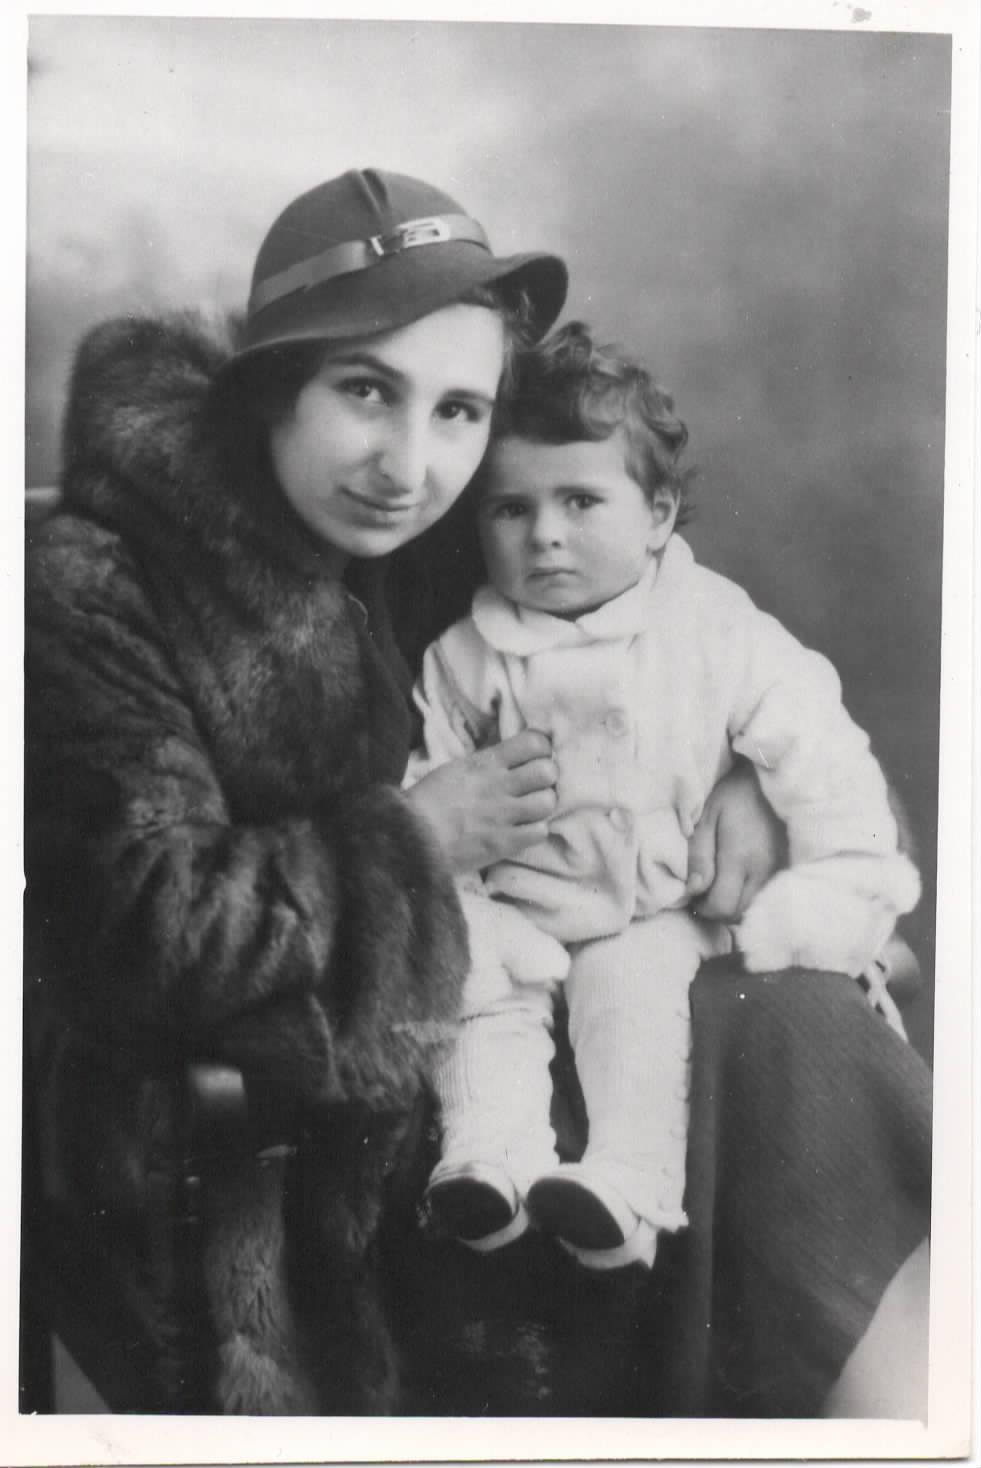 Eva in 1943 with her daughter, Sara's Aunt